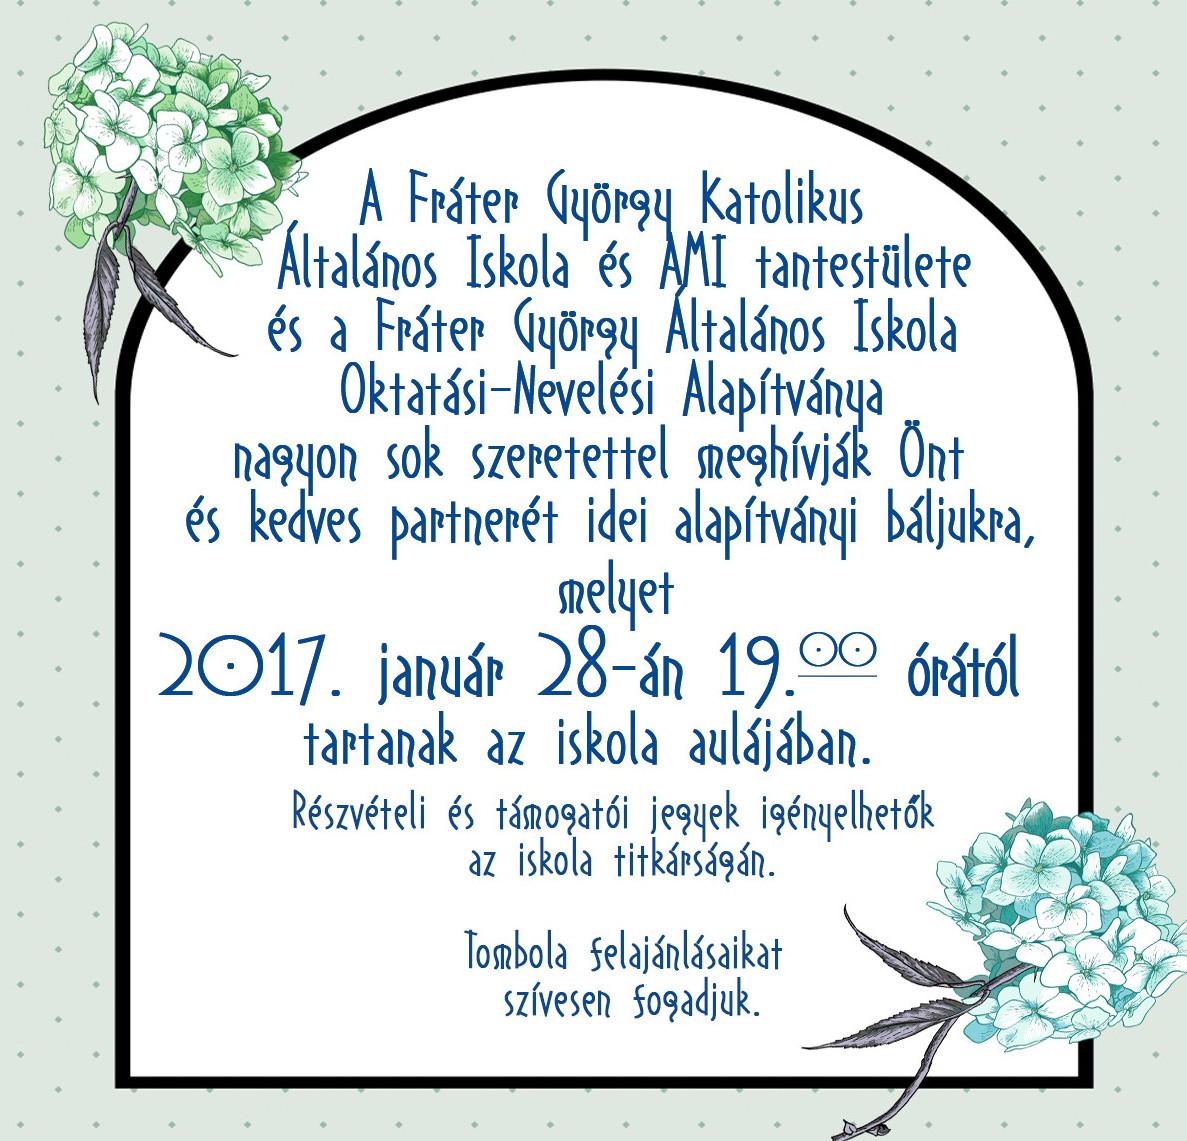 alapitvanyi-bal-meghivo-2017